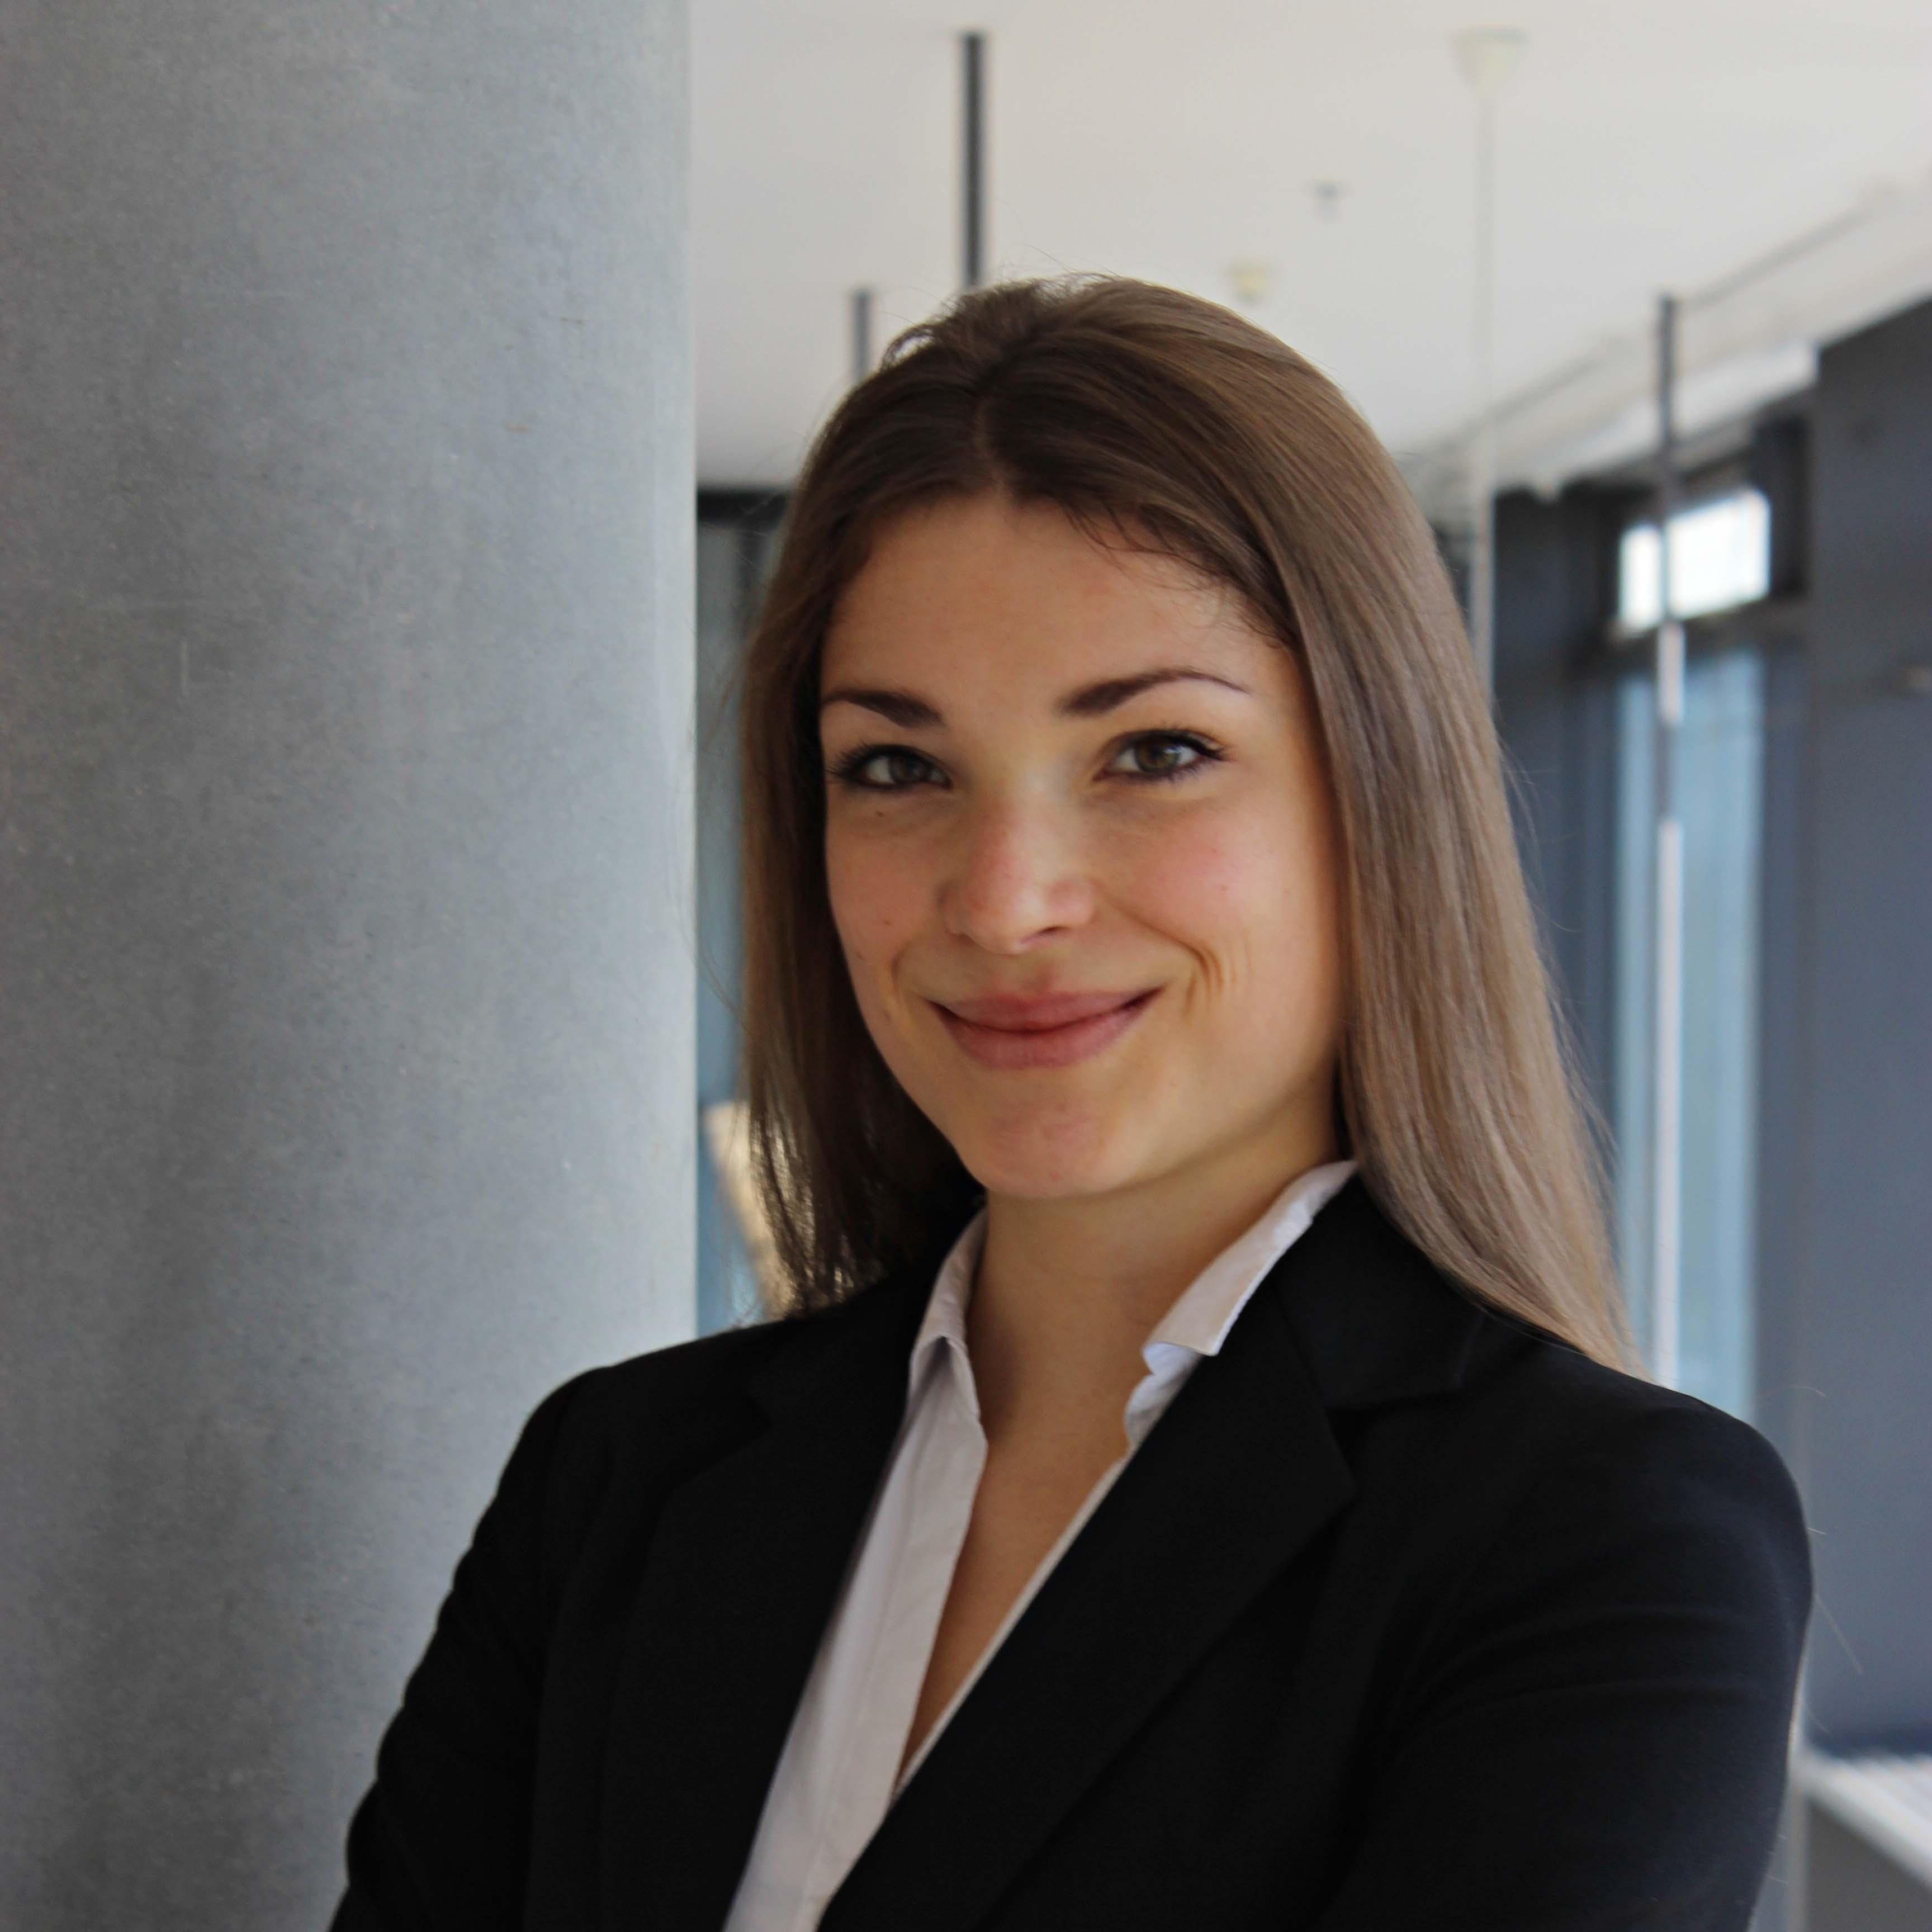 Lena Ebenritter